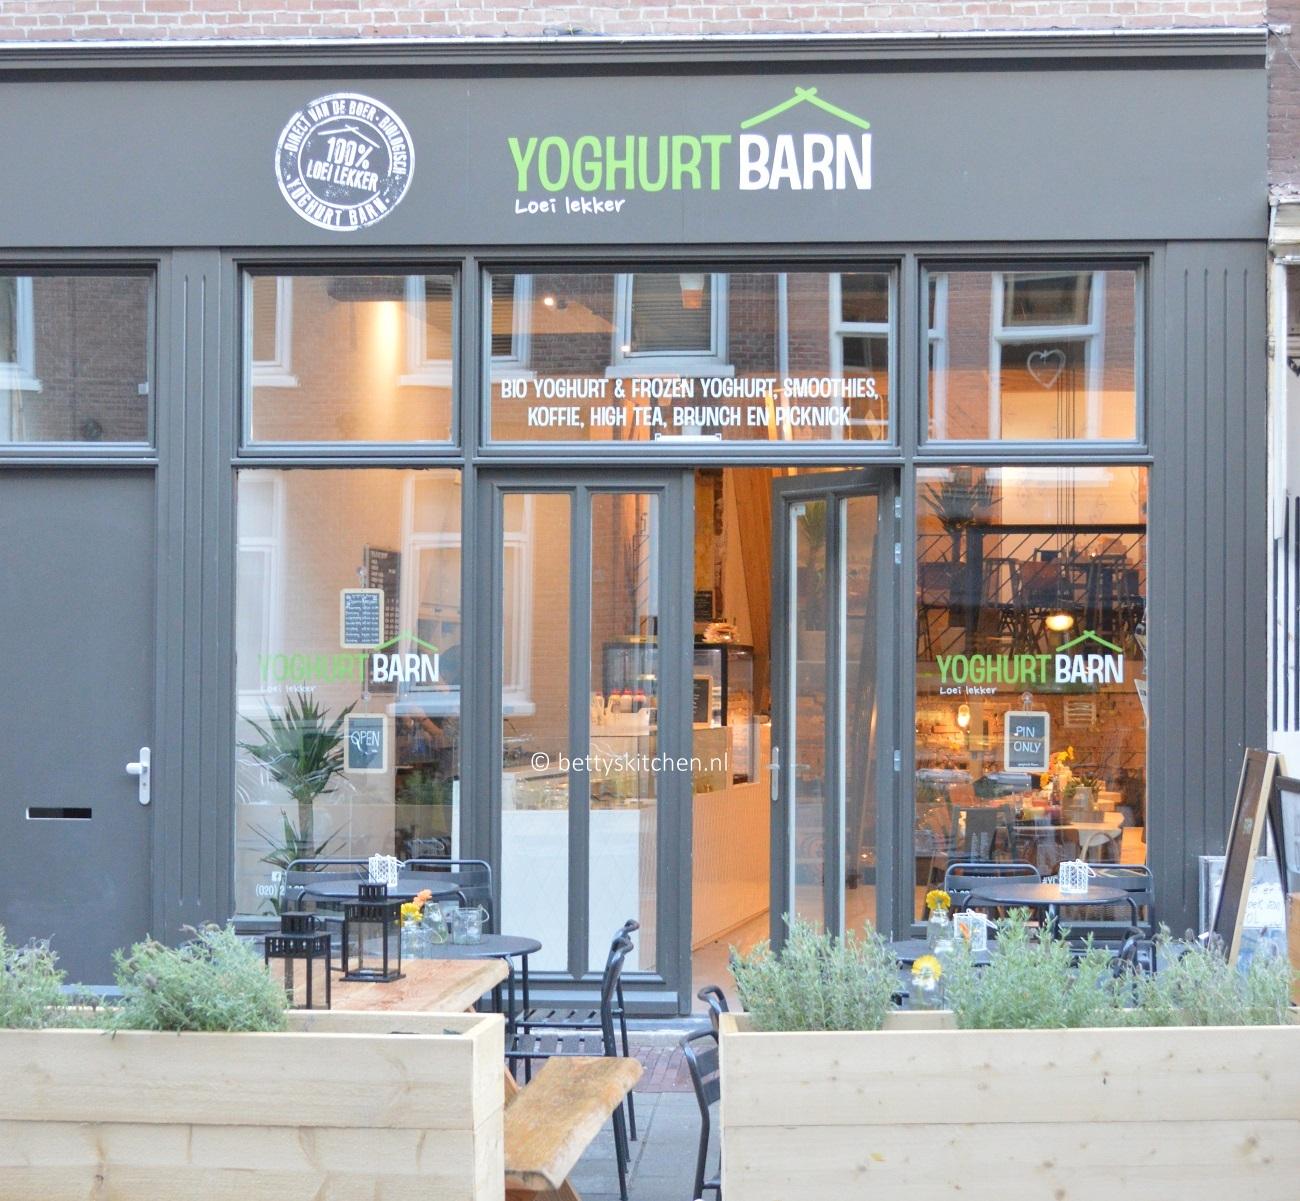 Yoghurt Barn bloggers event